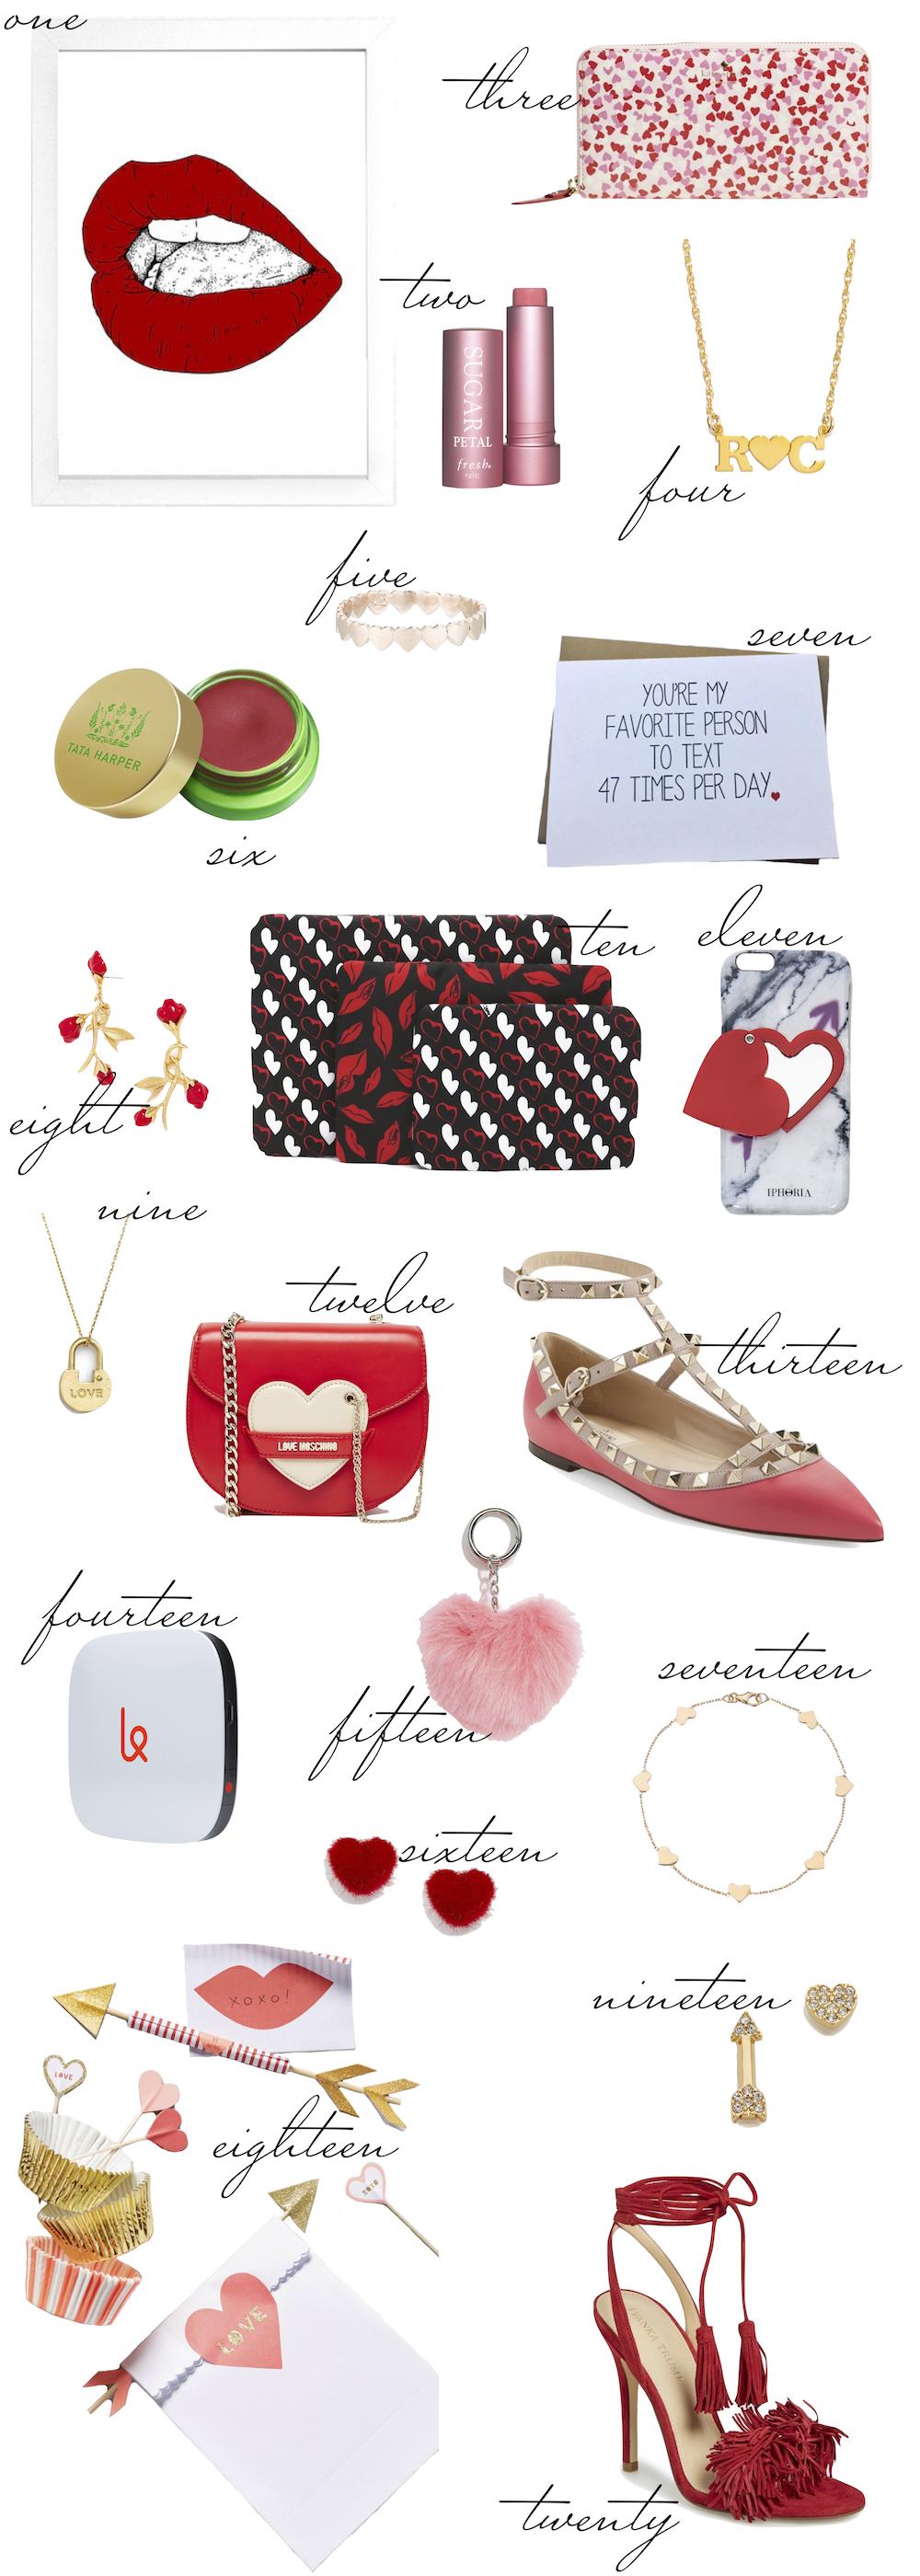 Valentines Day Collage